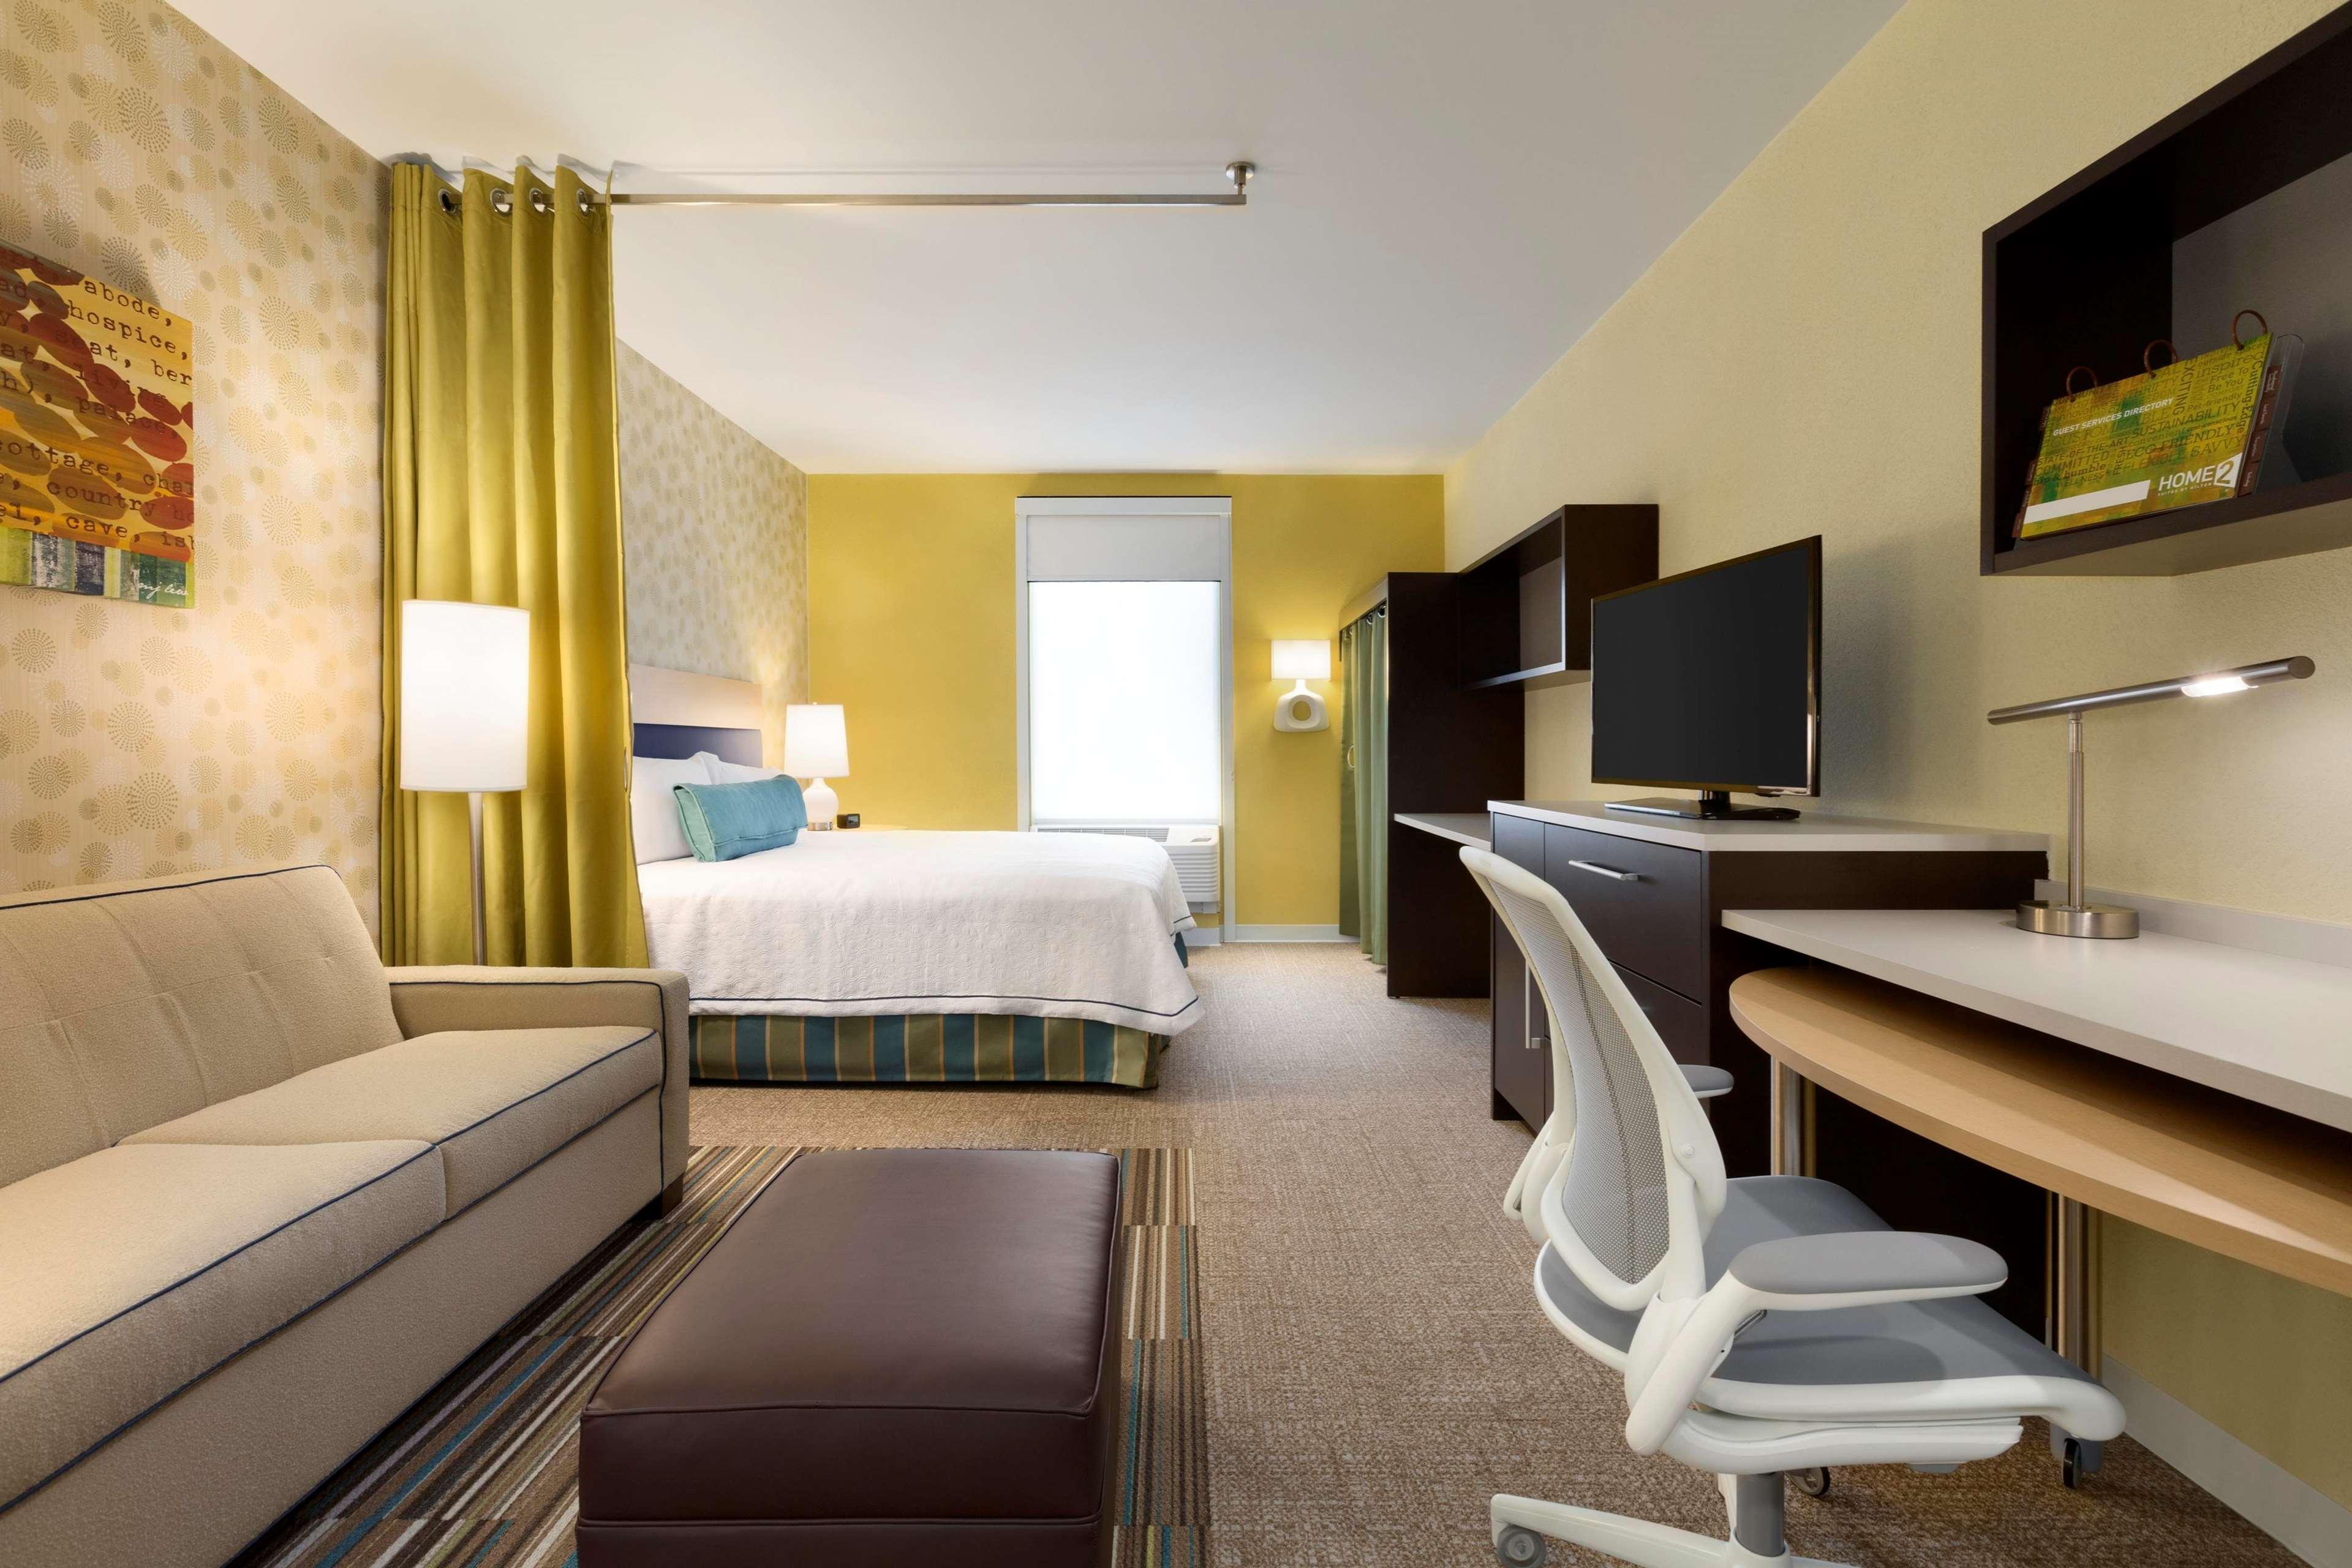 Home2 Suites by Hilton Houston Pasadena image 15